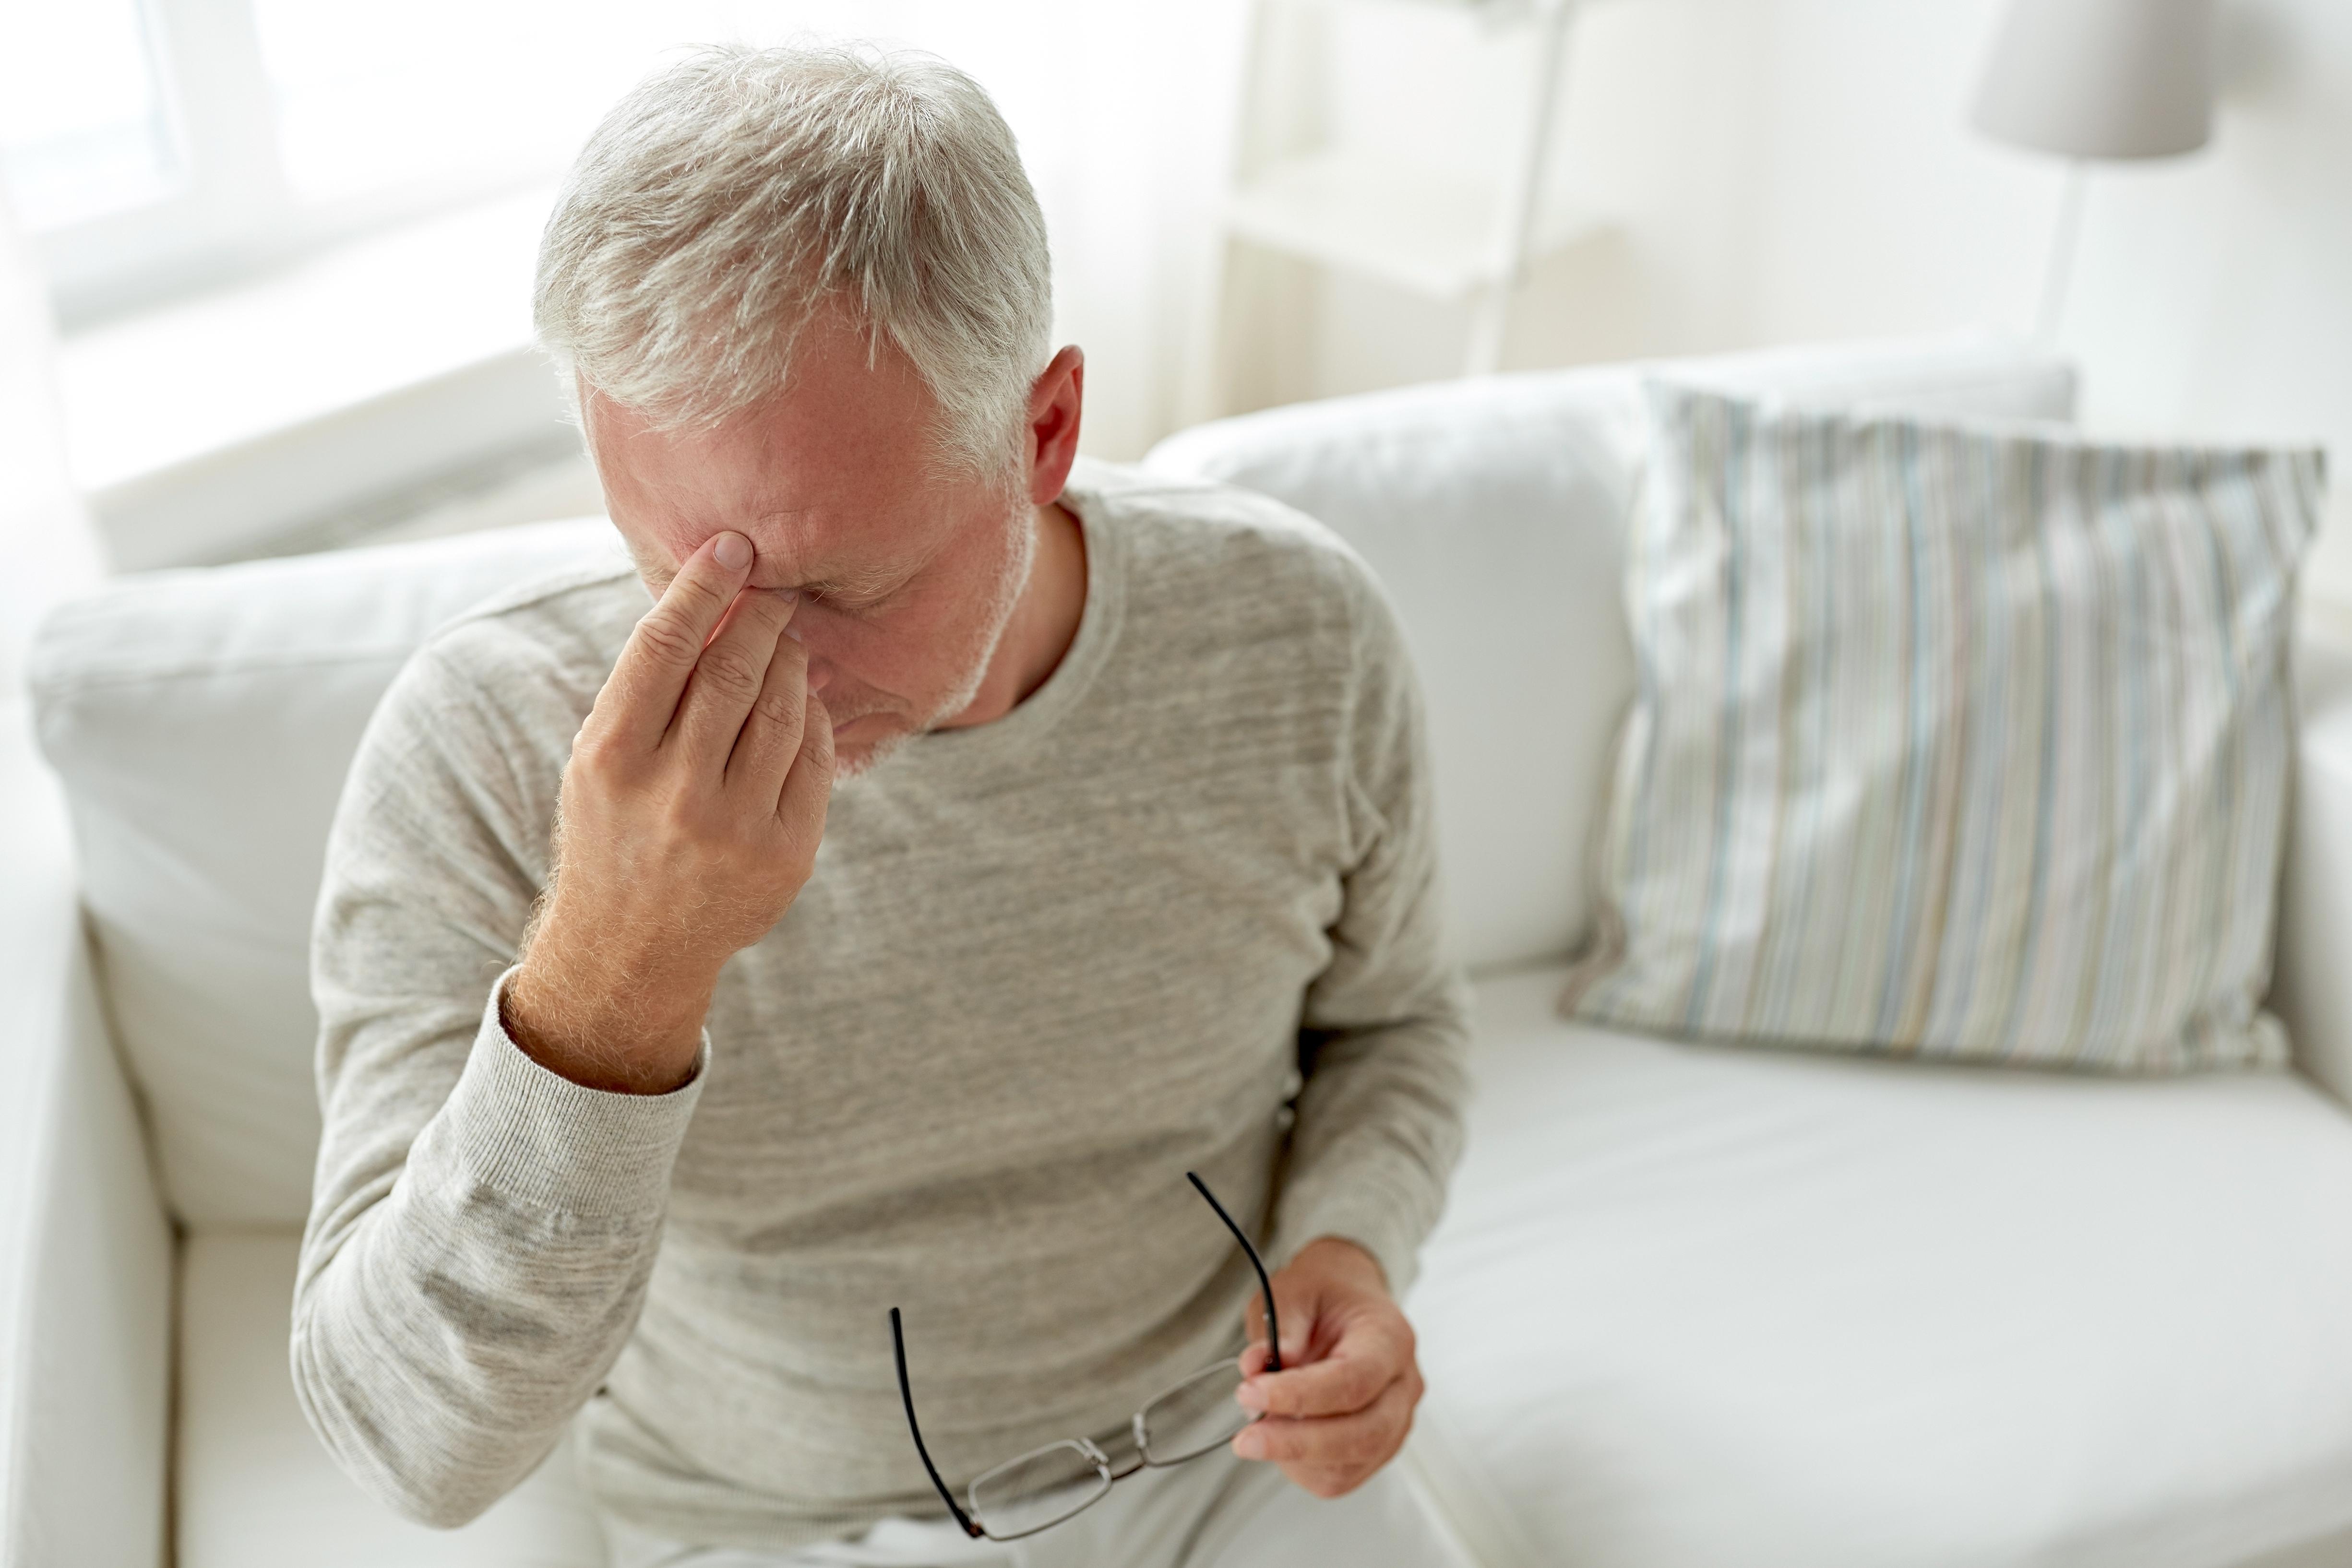 Treatment of headache at Highgate Private Hospital